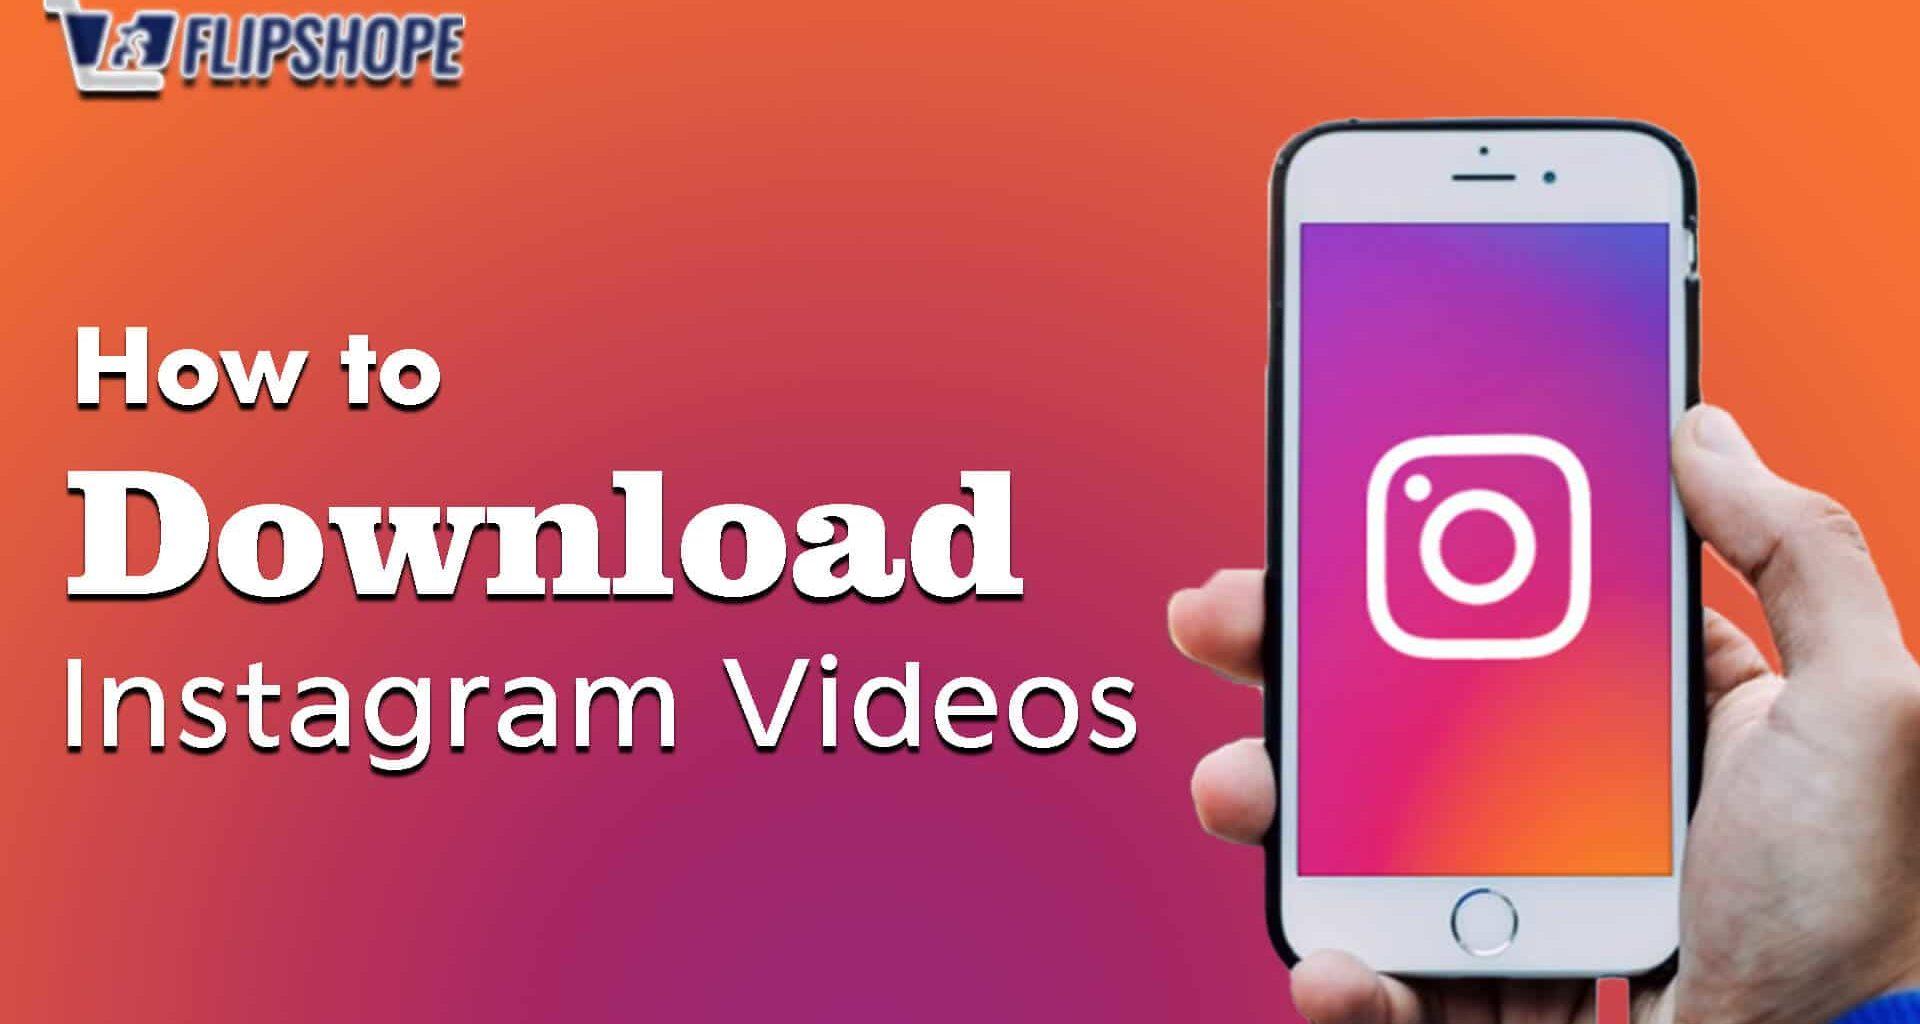 instgram video download